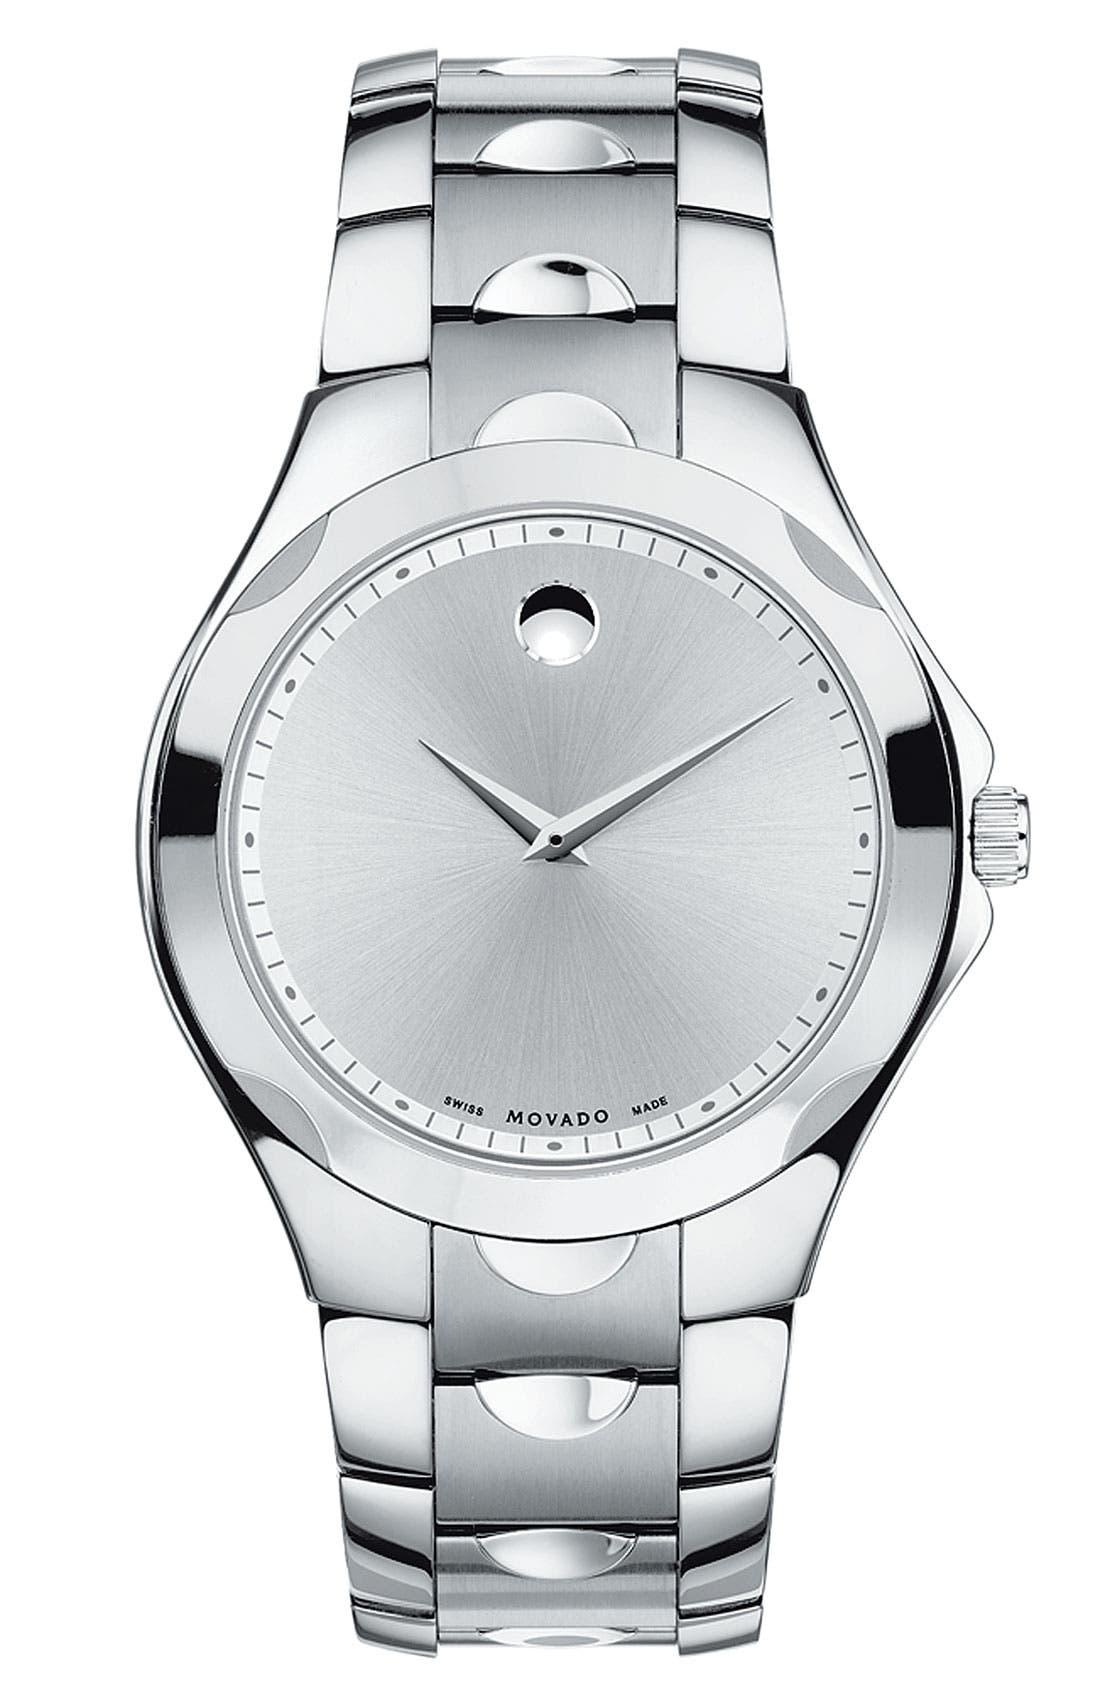 Main Image - Movado 'Luno Sport' Stainless Steel Bracelet Watch, 41mm